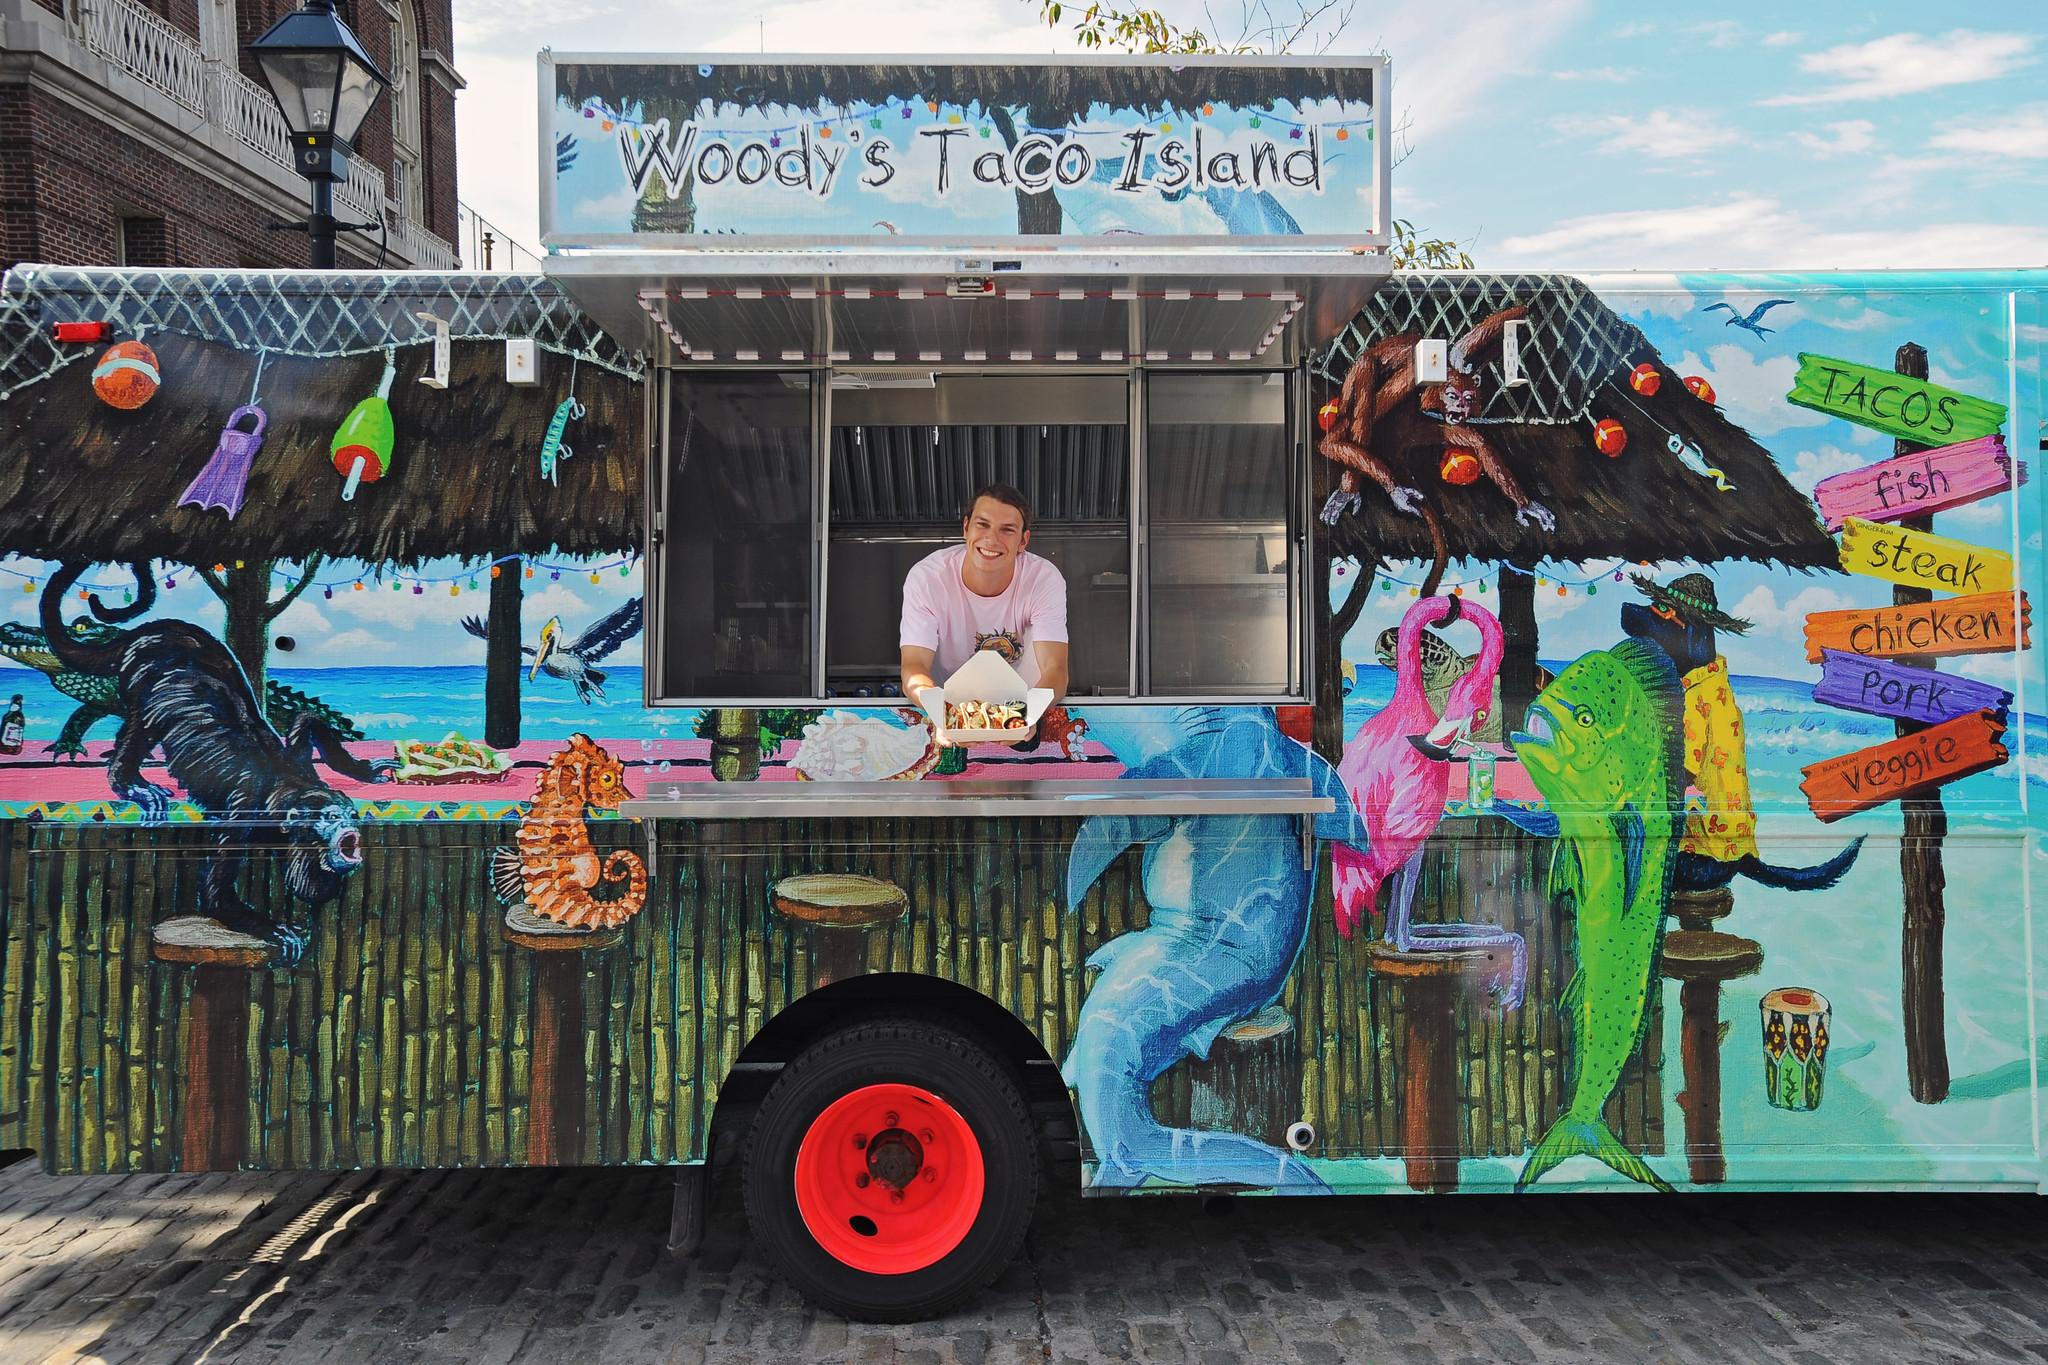 Baltimore Food Truck Bbq